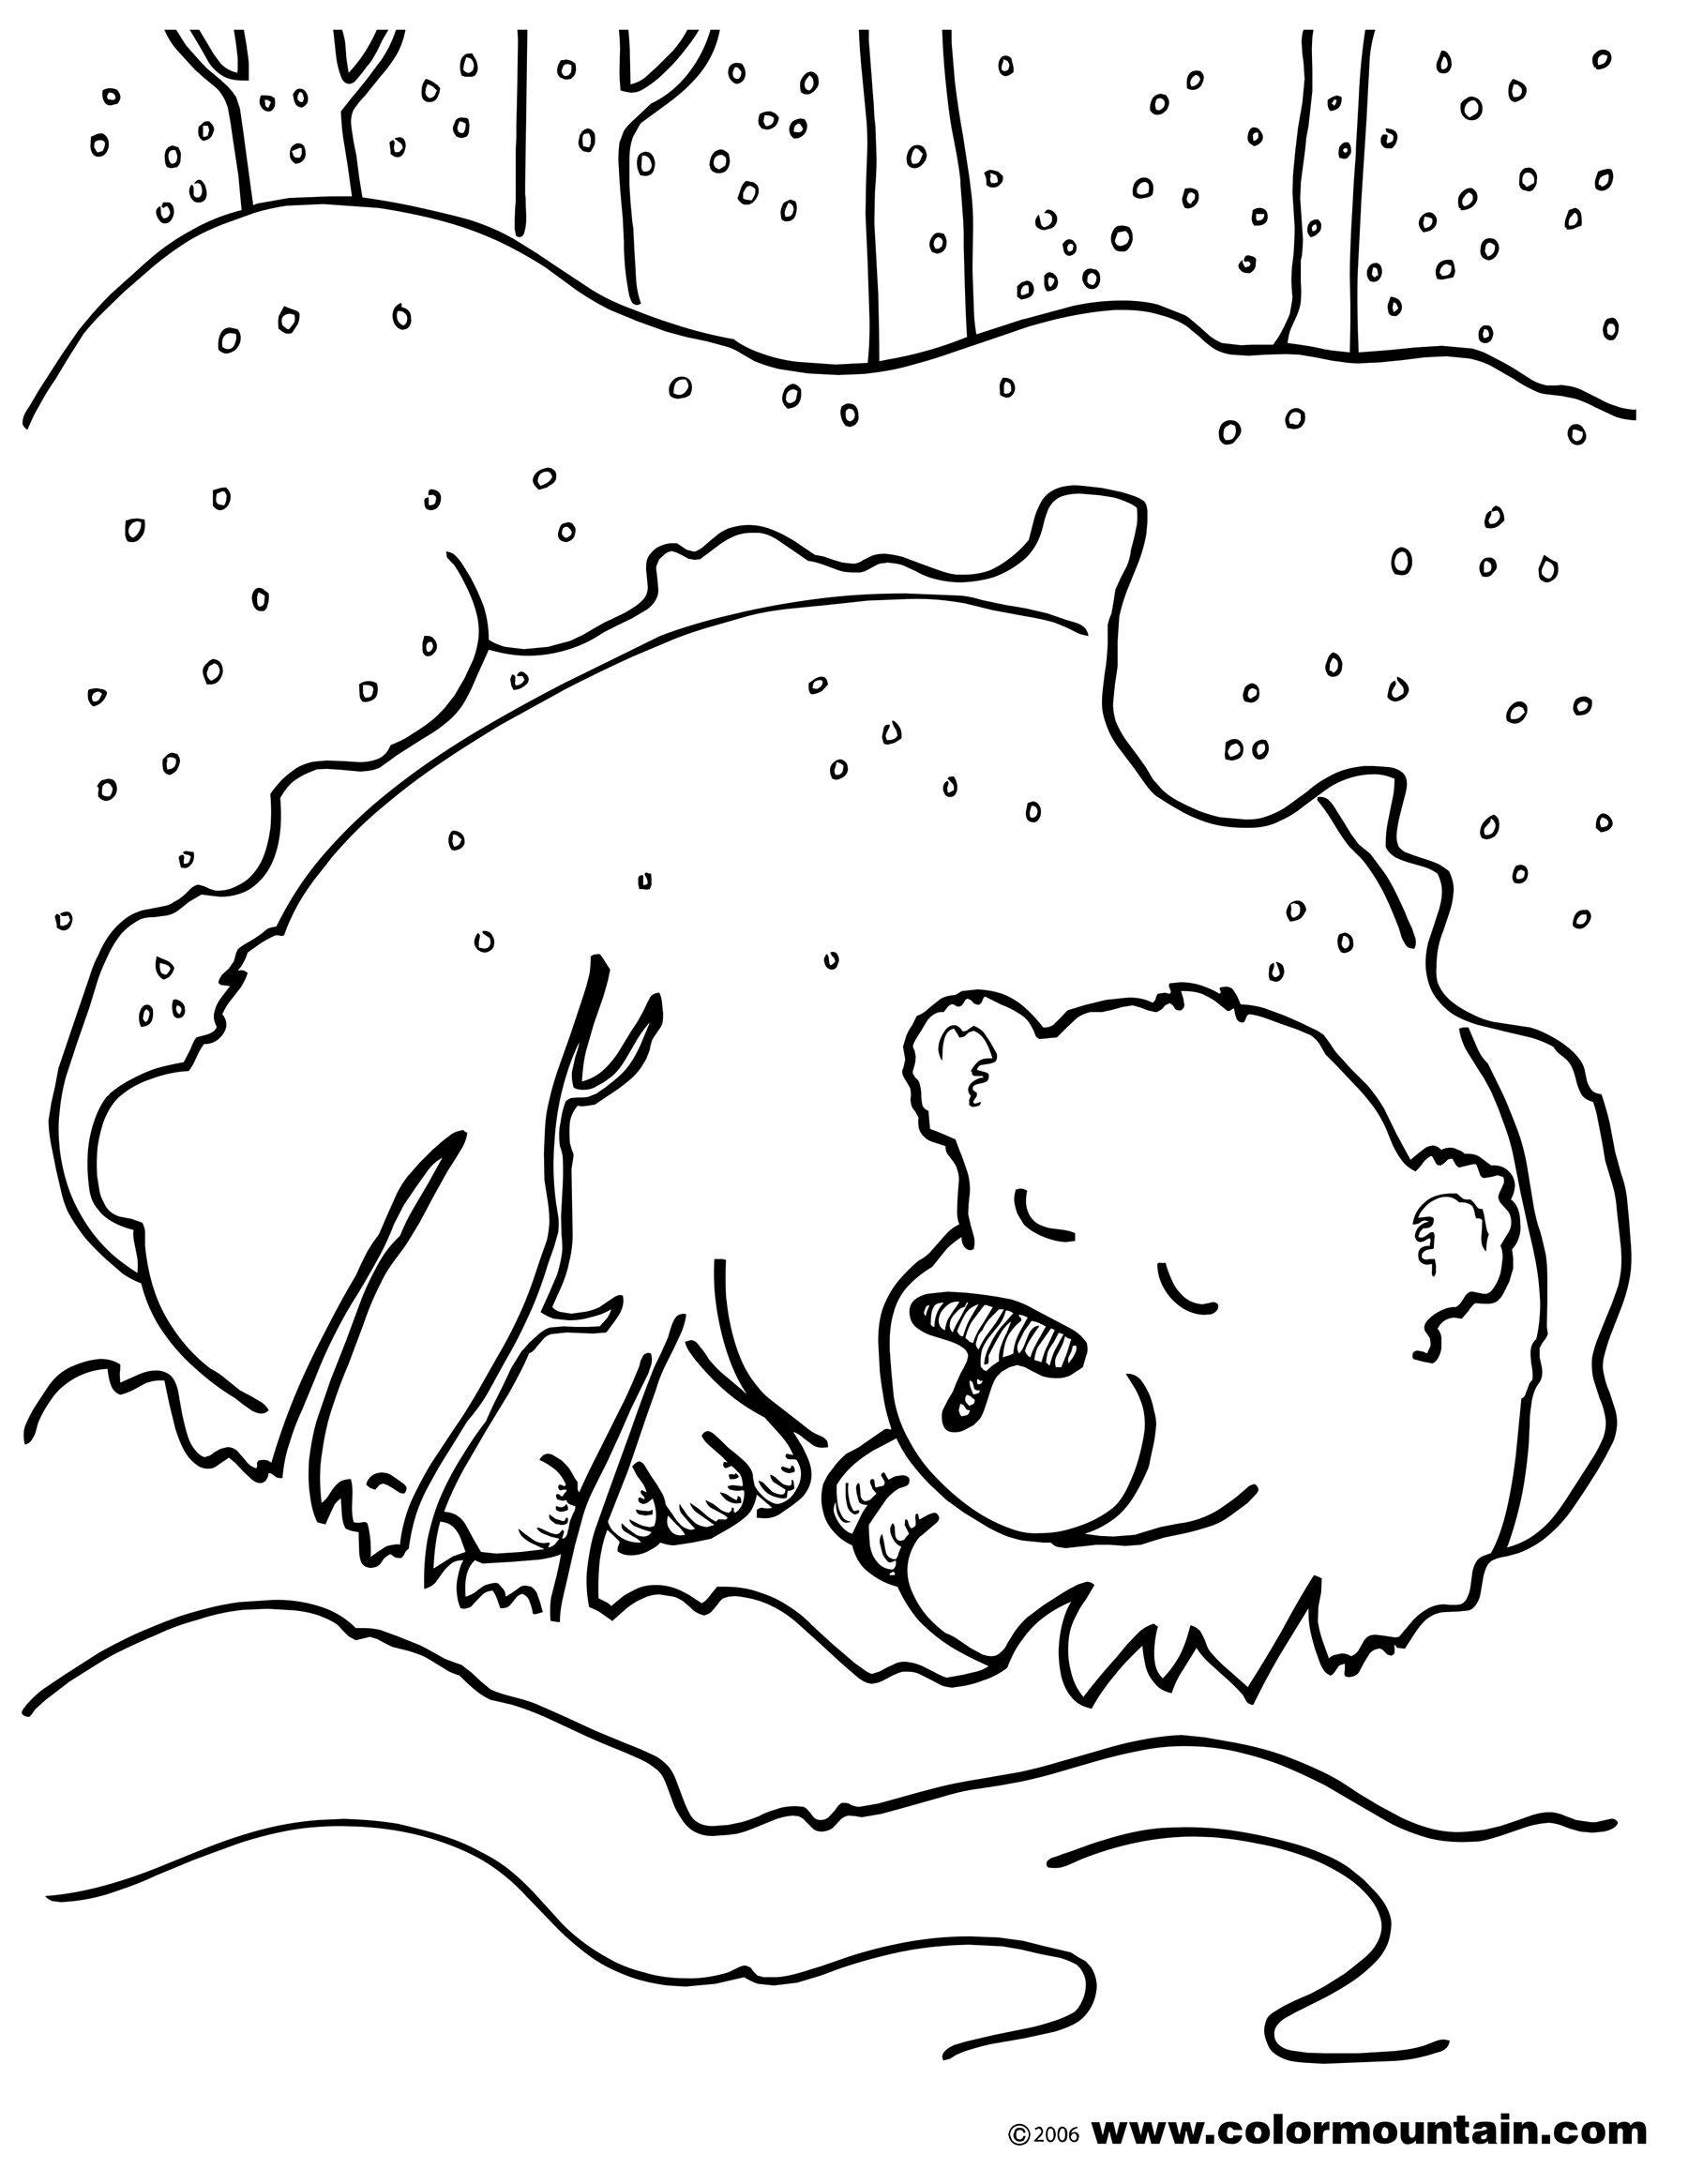 Bear color sheet coloring. Bears clipart hibernating